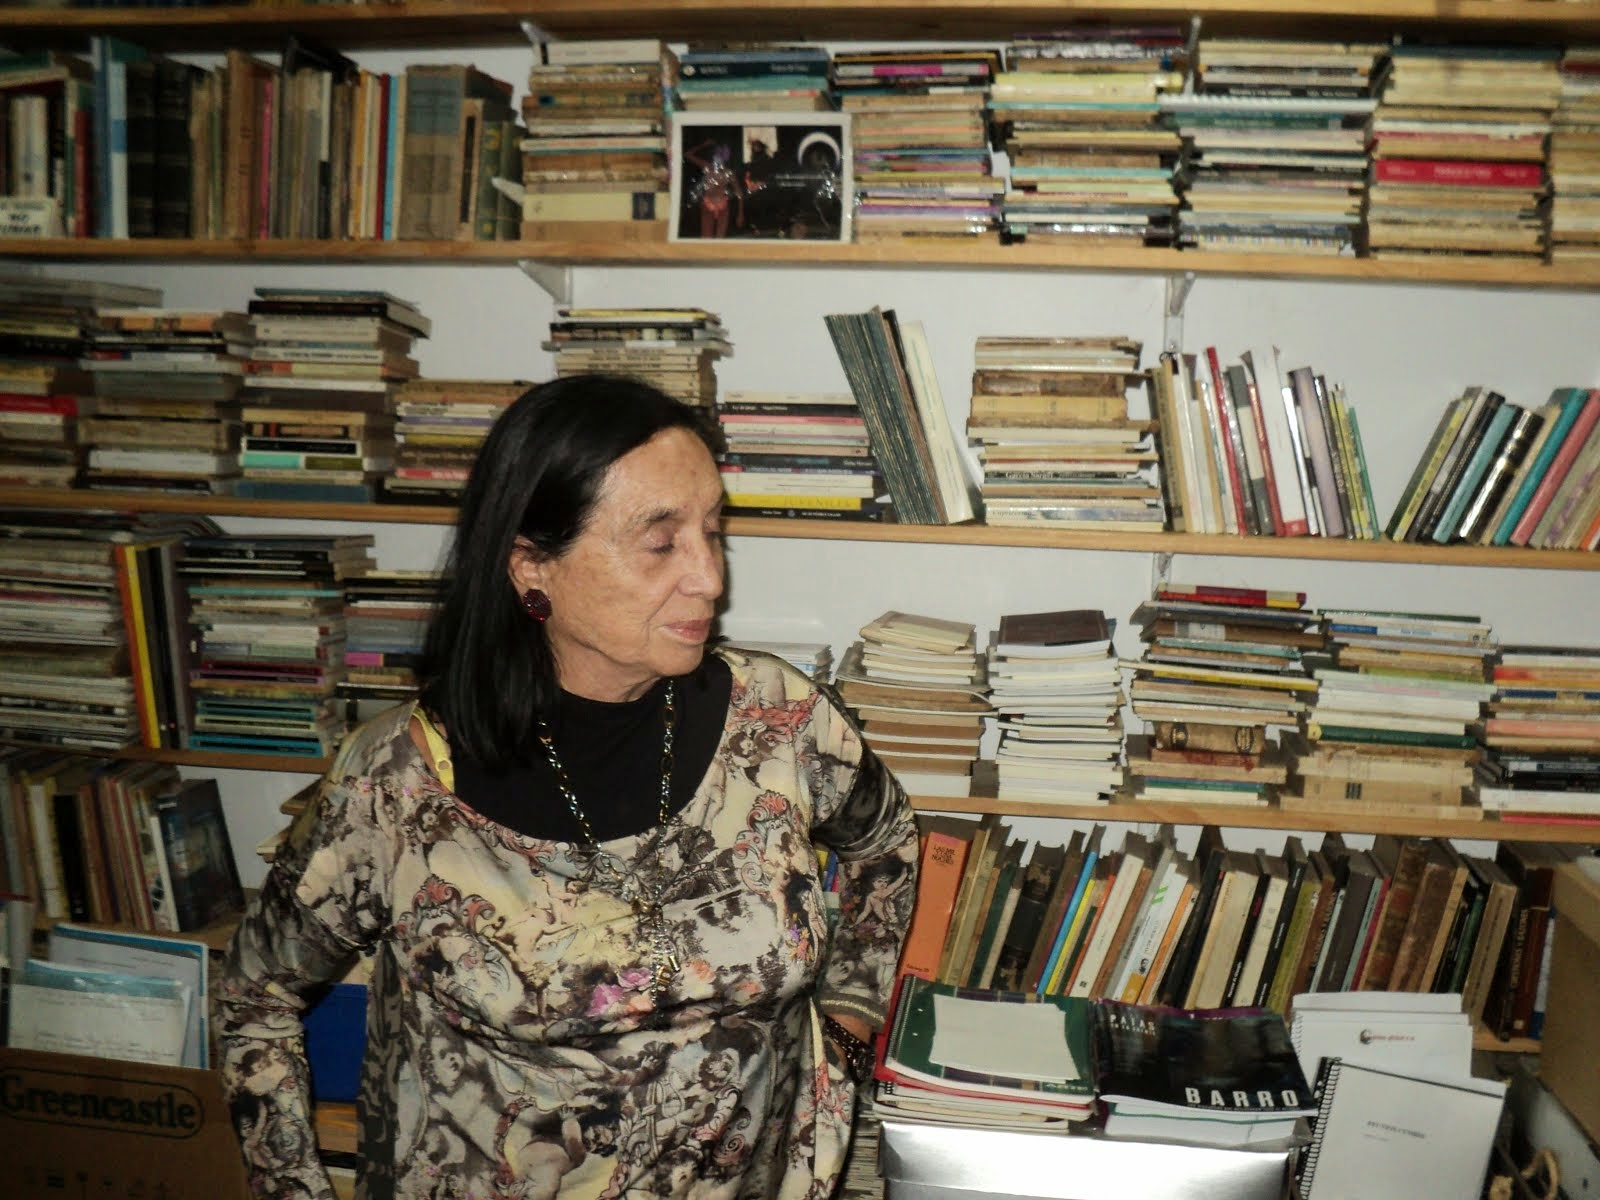 ELVIRA MAISON